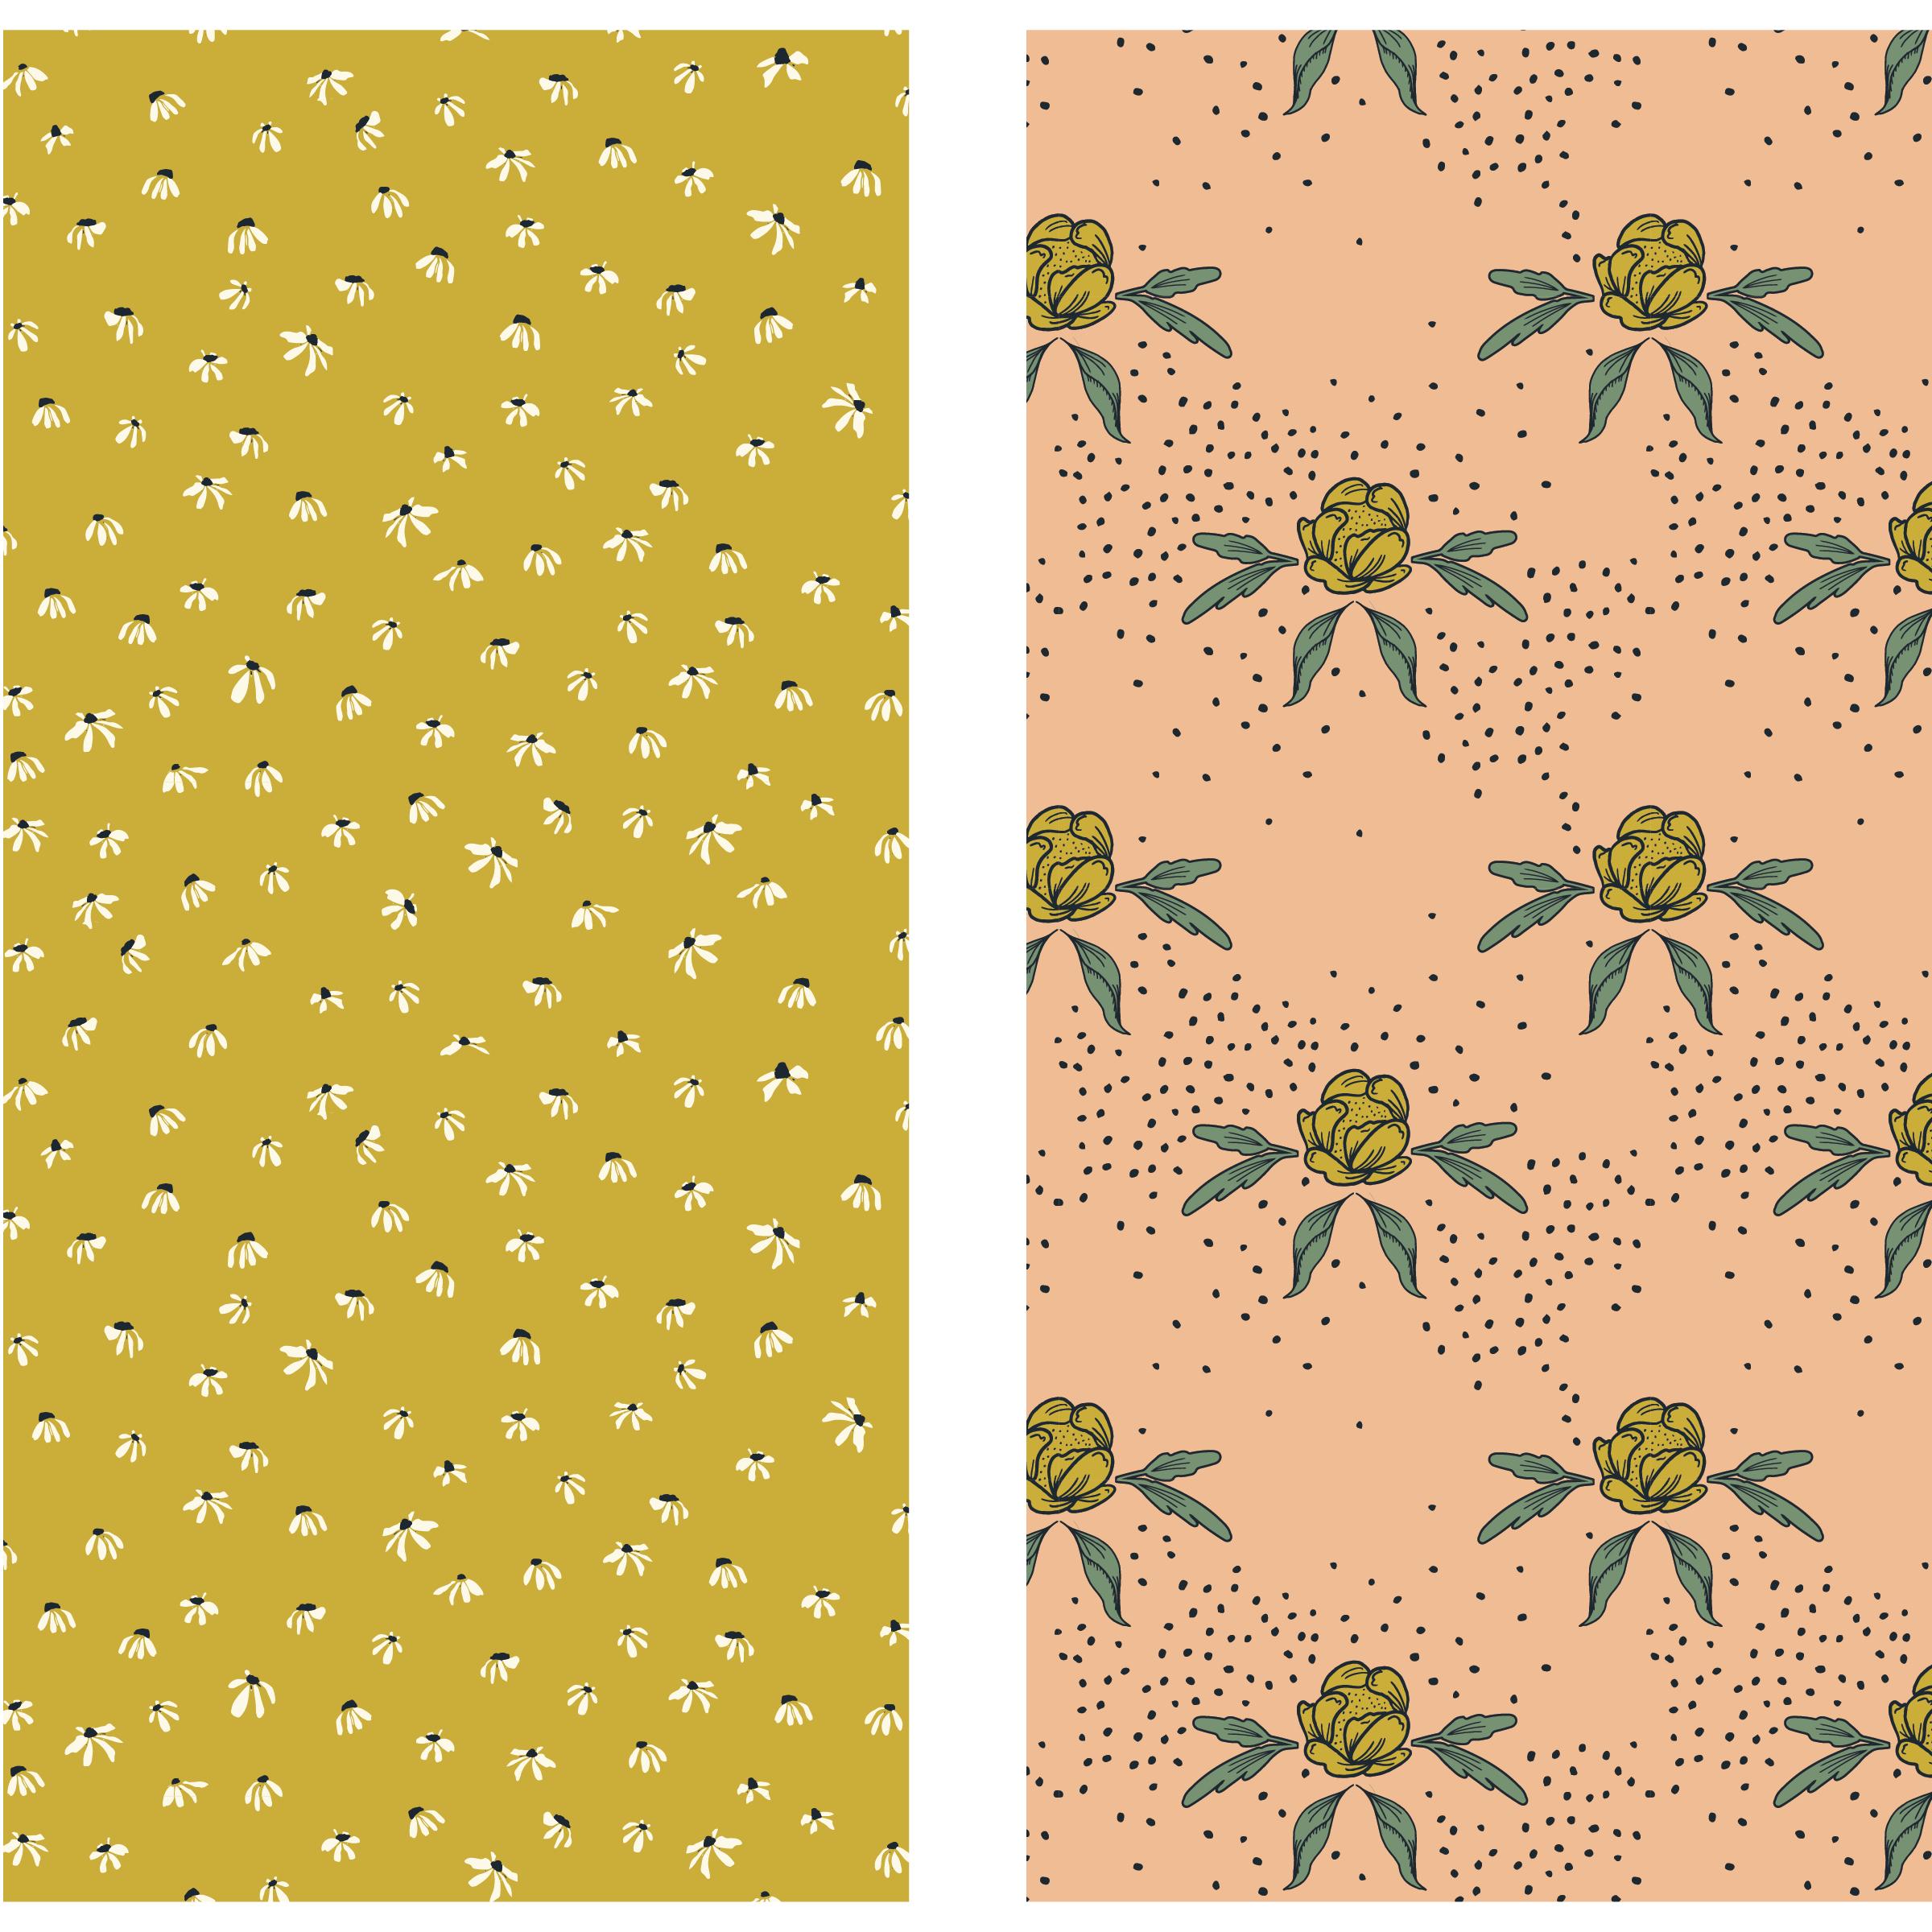 by HOPE johnson surface pattern design_pattern pair8.jpg